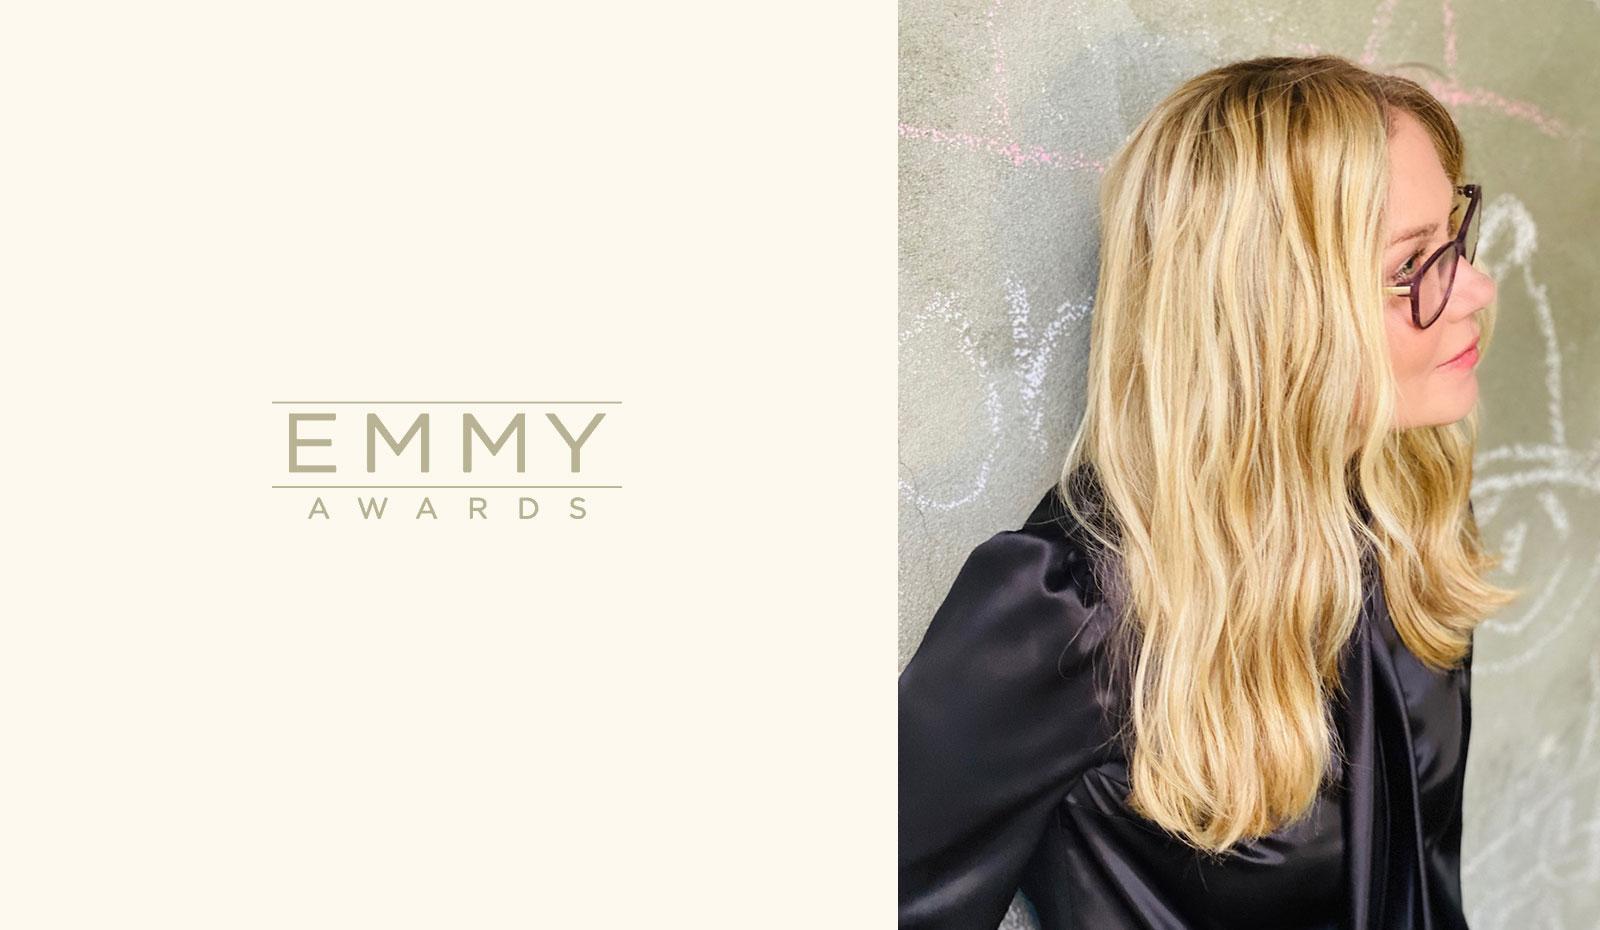 2020 Emmy's: Christina Applegate's High Shine Waves